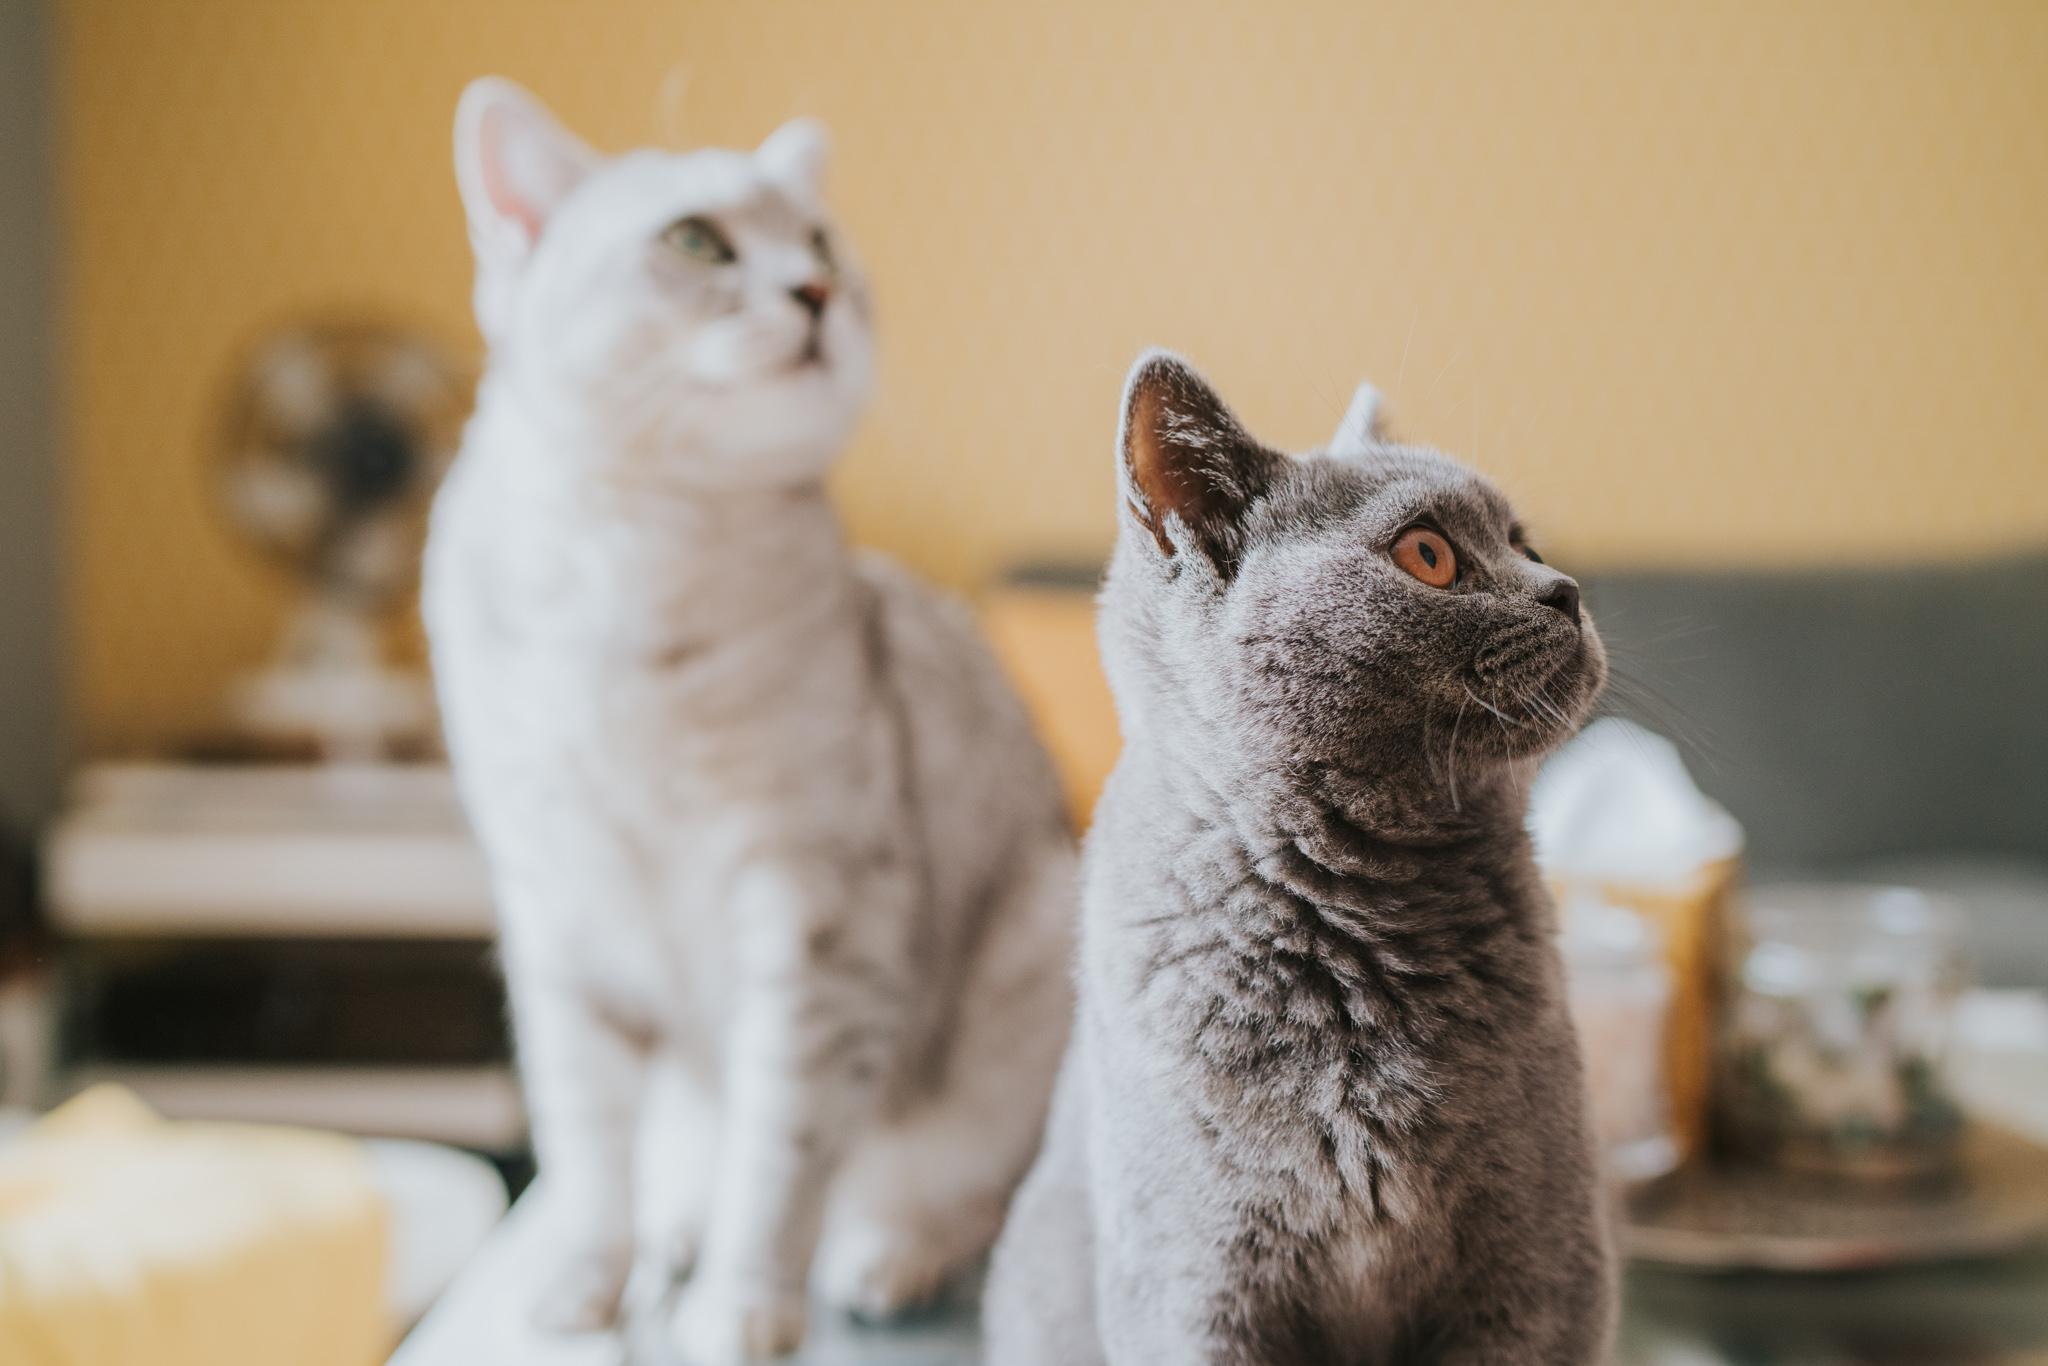 chara-neil-at-home-pre-wedding-session-cats-coalhouse-fort-grace-elizabeth-colchester-essex-alternative-wedding-lifestyle-photographer-essex-suffolk-norfolk-devon (6 of 47).jpg